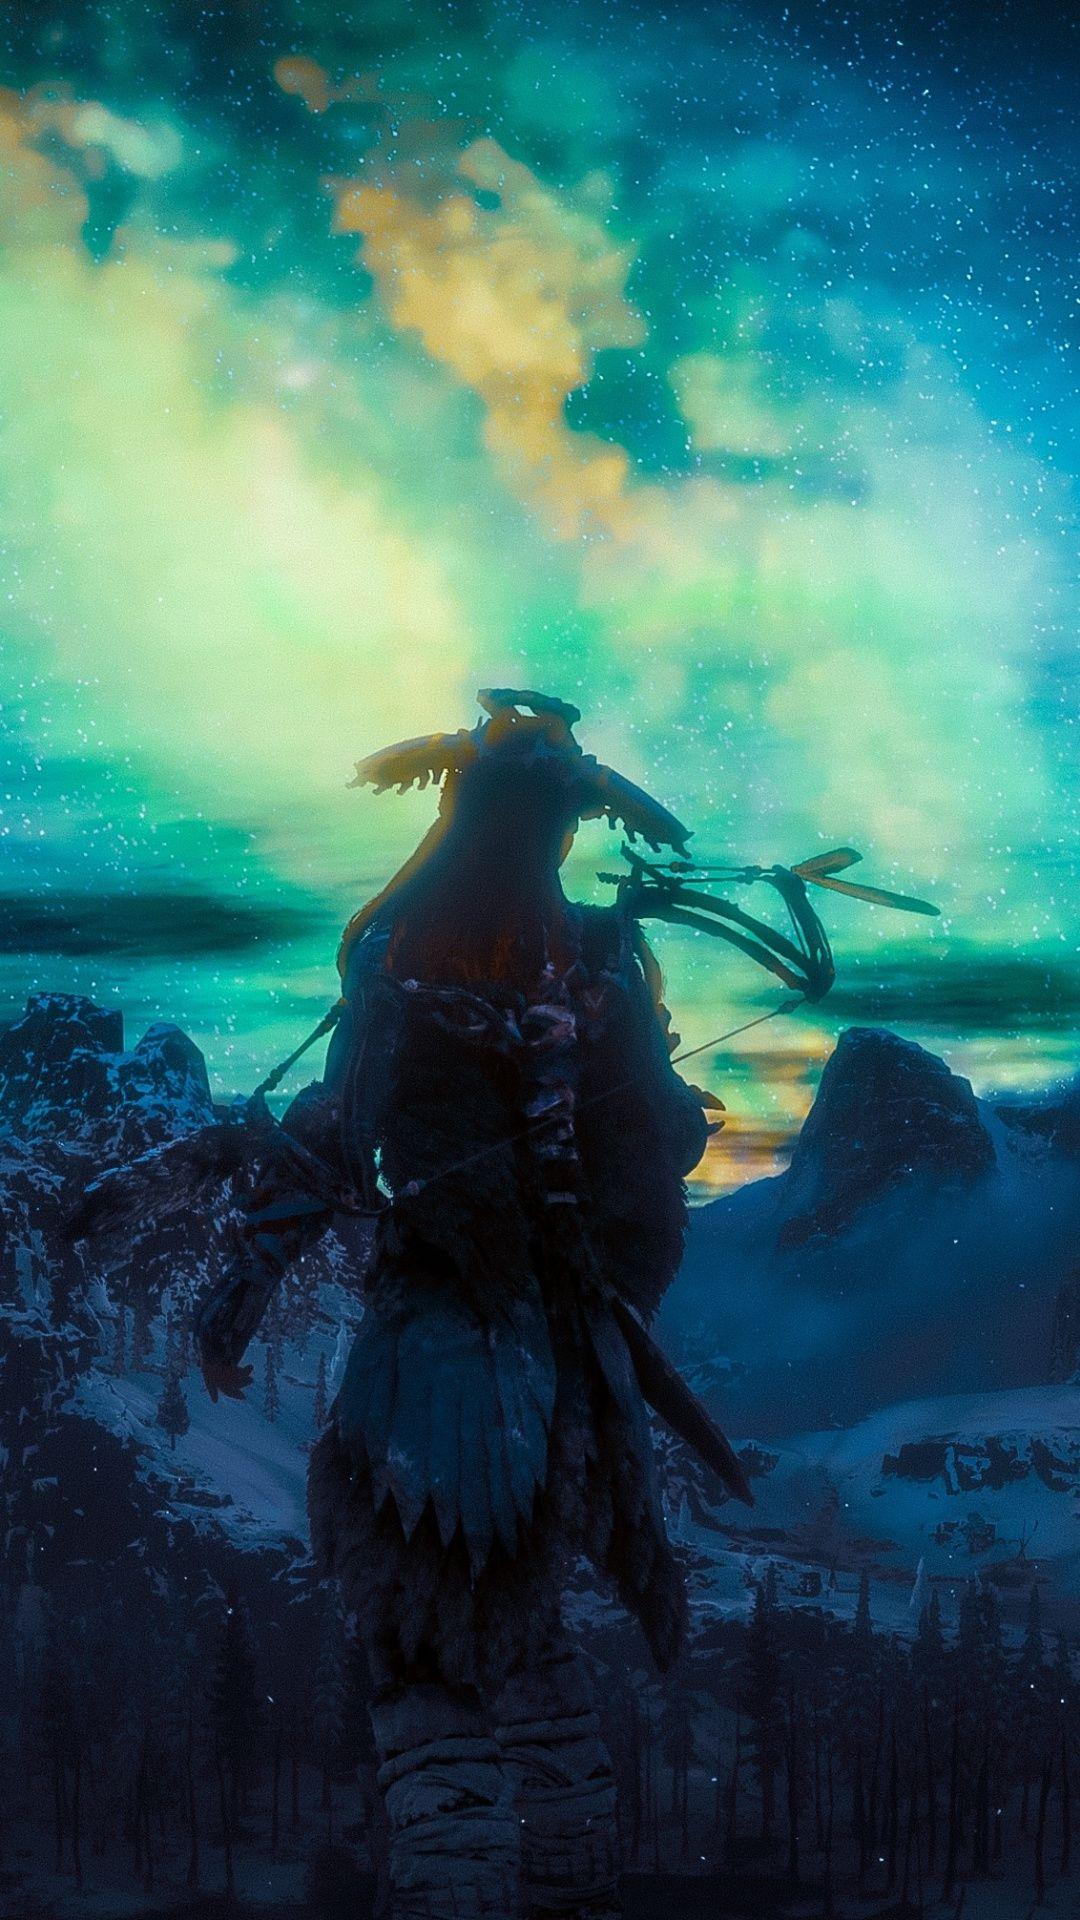 Northern Lights, Aloy, video game, Horizon Zero Dawn, 1080x1920 wallpaper